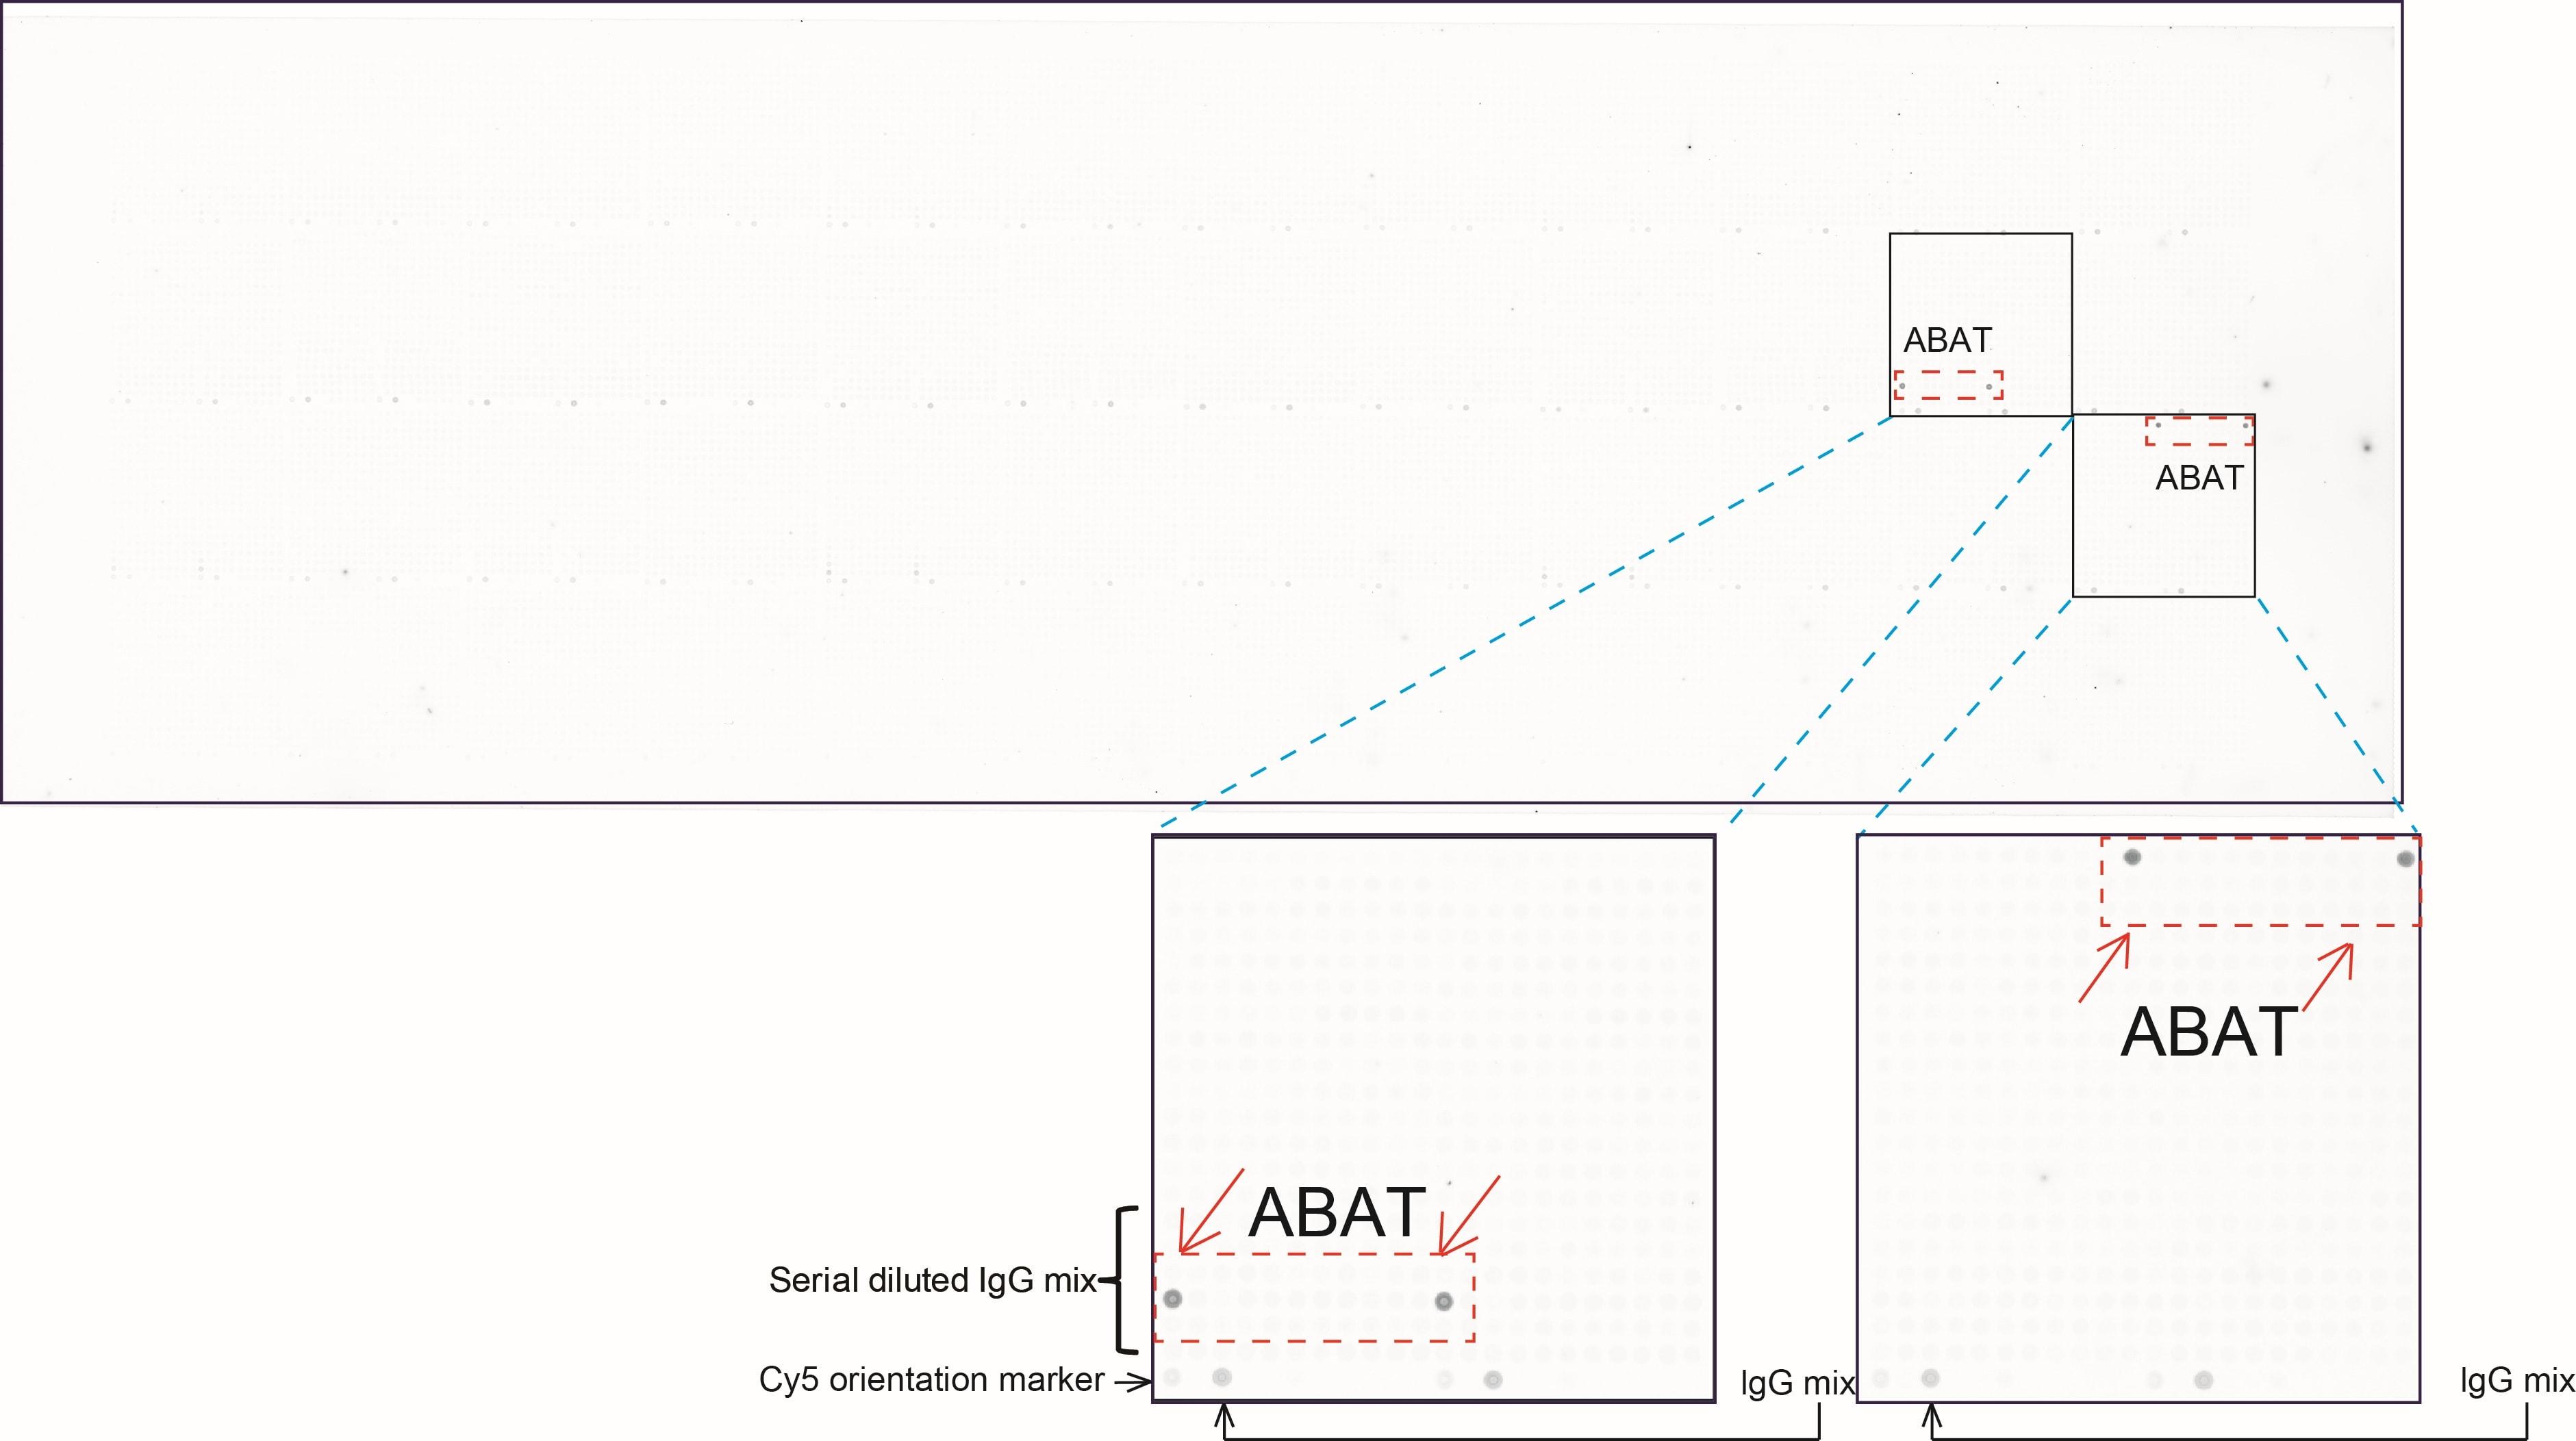 ABAT Antibody in Peptide array (ARRAY)